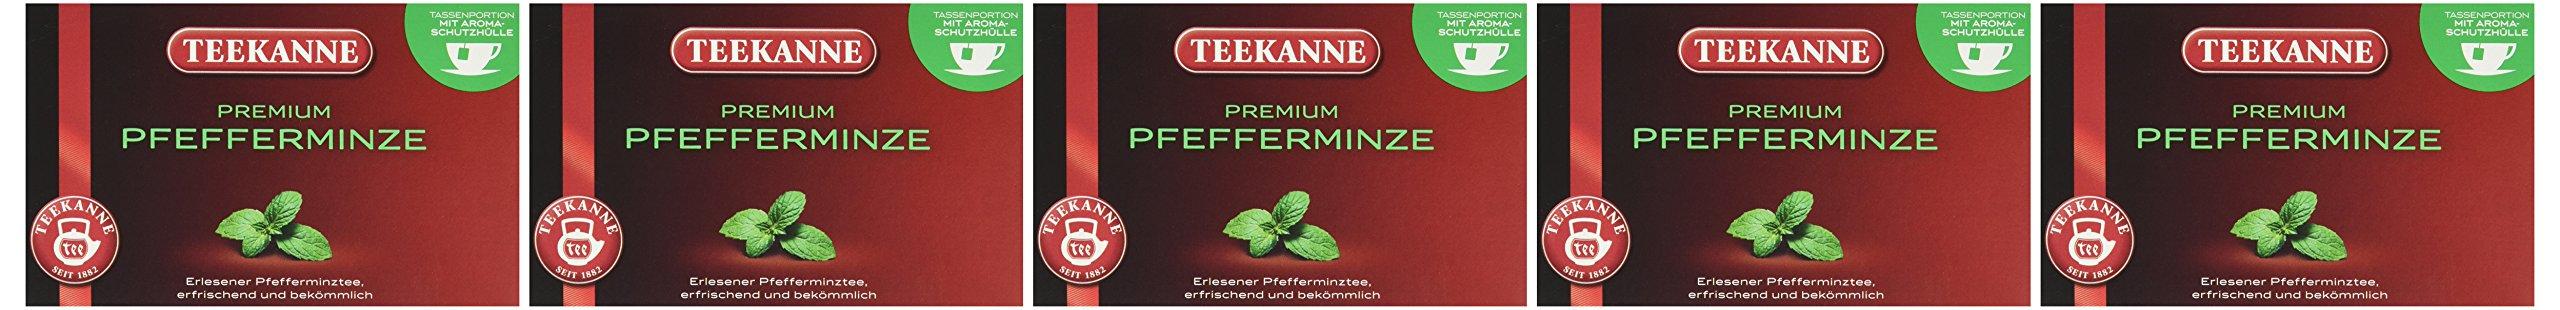 Teekanne-Premium-Pfefferminze-20-Beutel